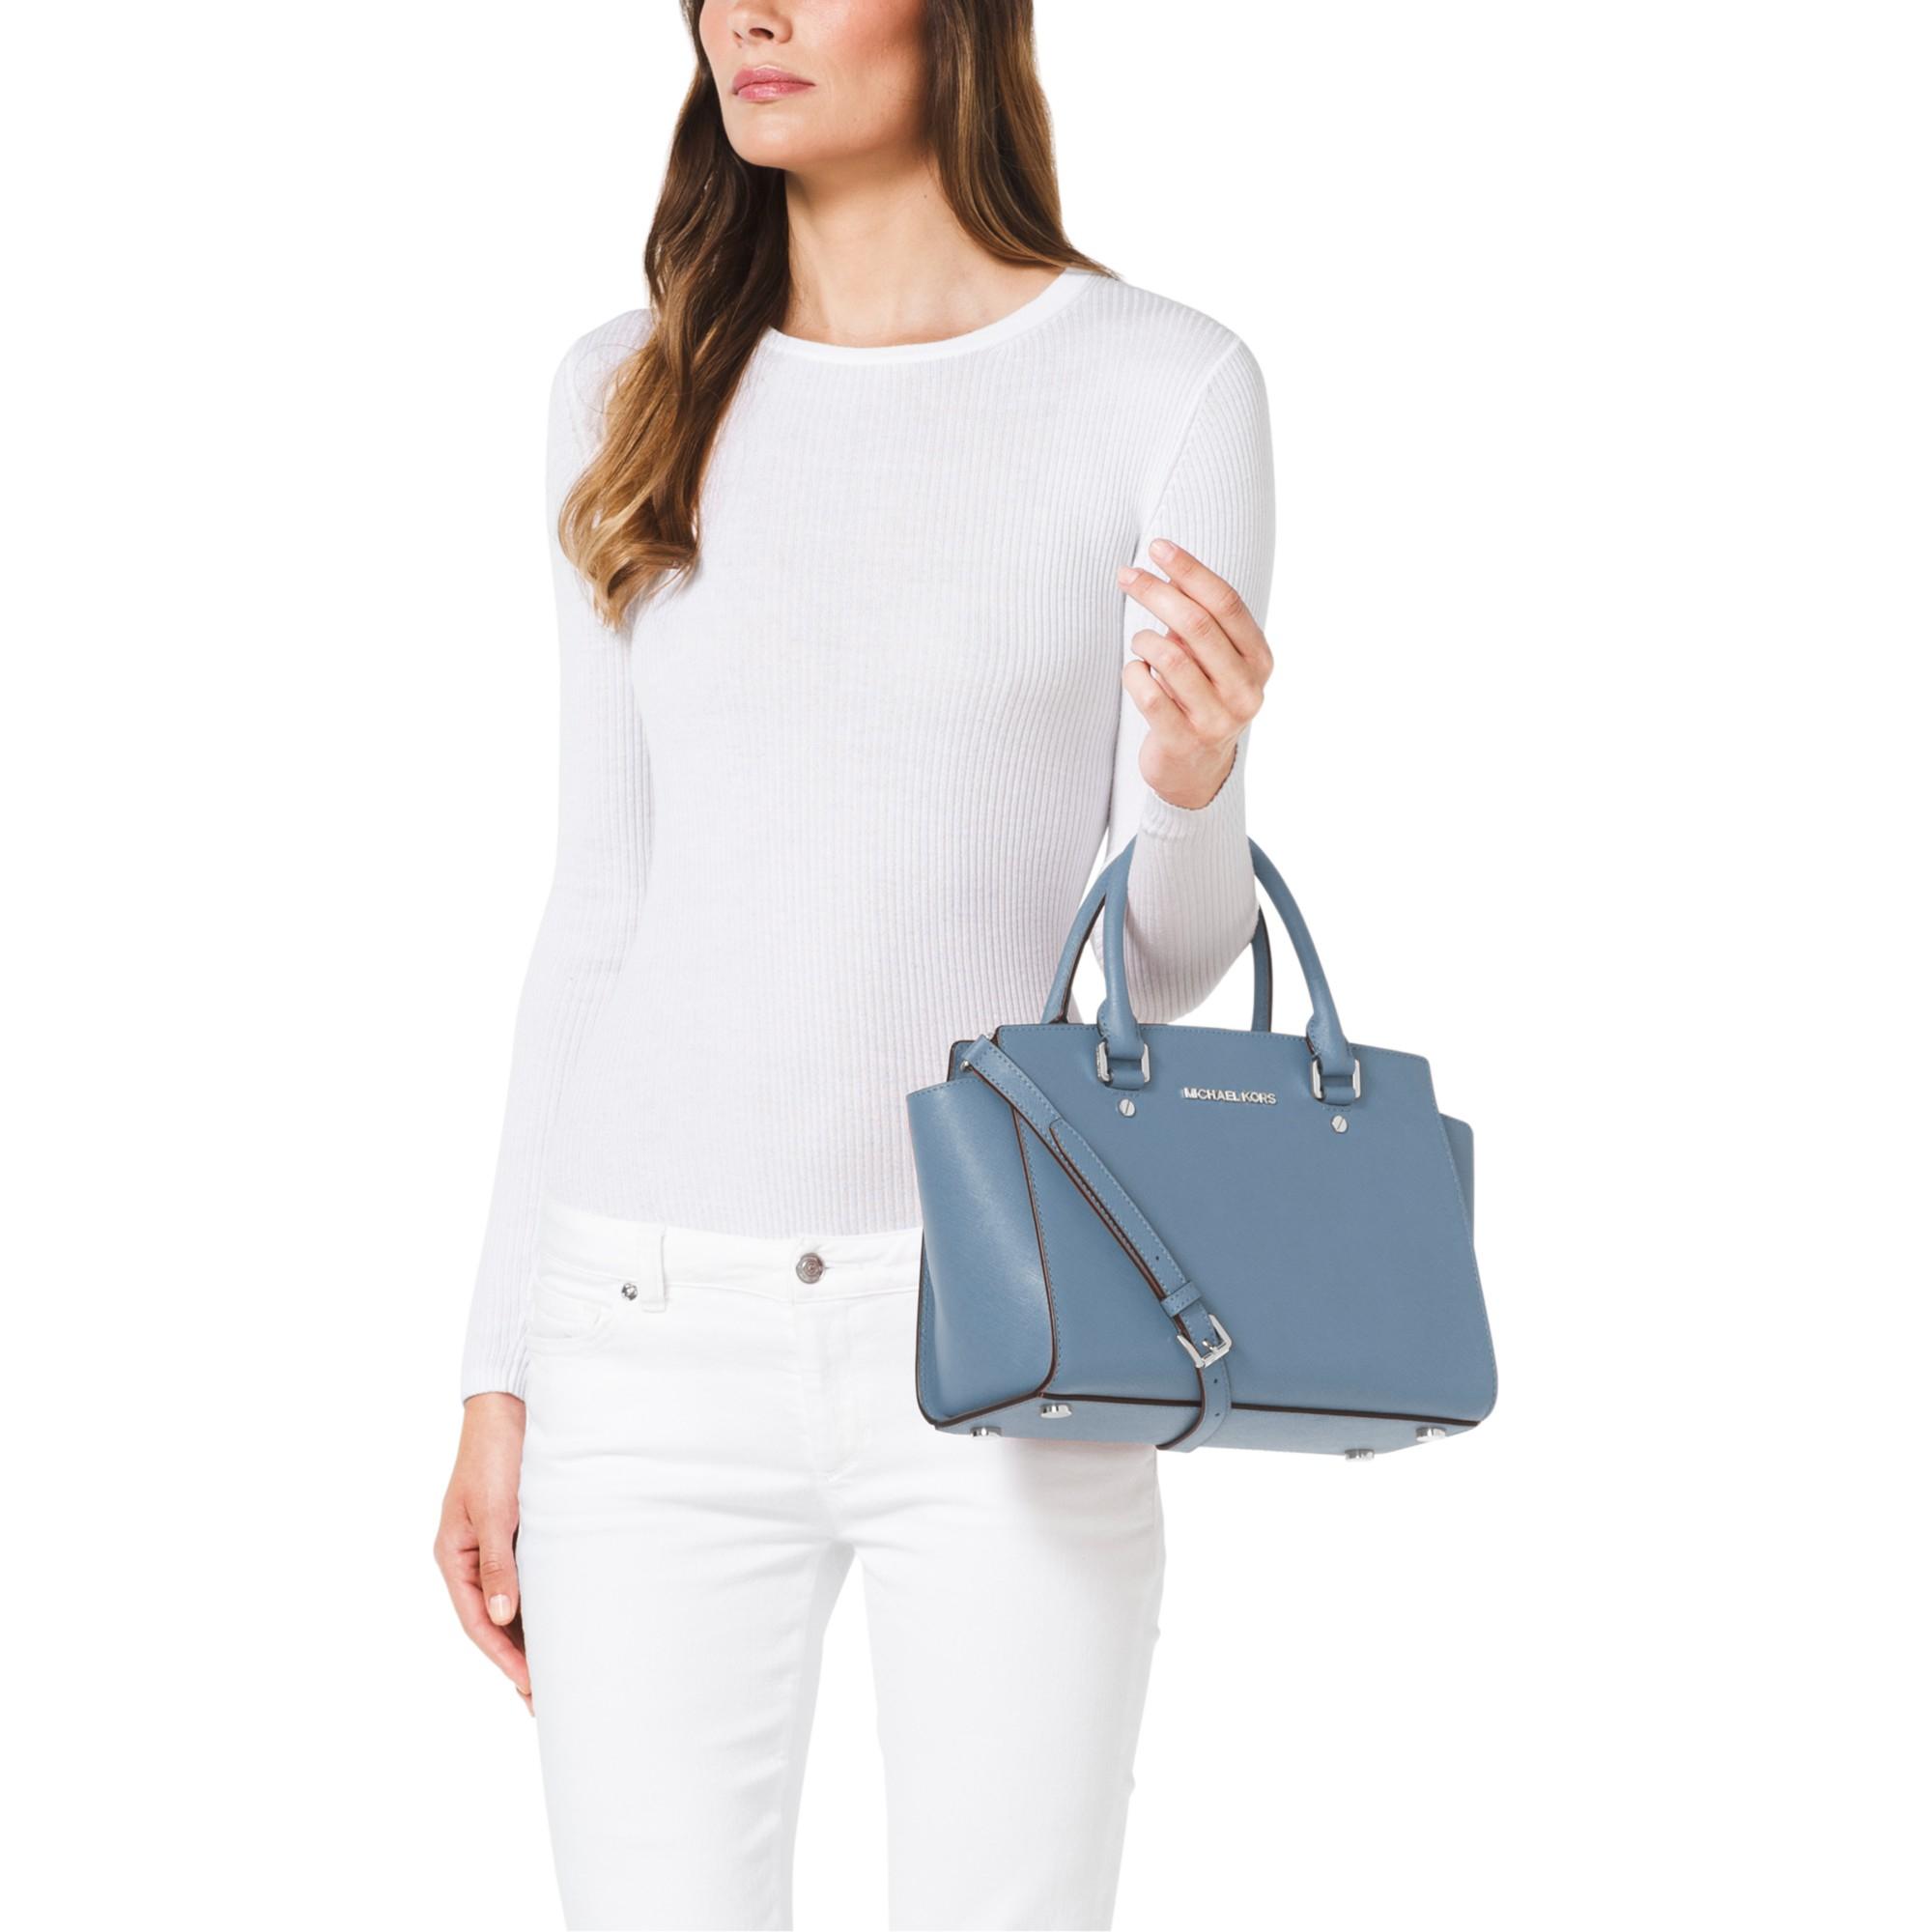 41e4e56bb82b76 MICHAEL Michael Kors Selma Medium Top Zip Leather Satchel in Blue - Lyst